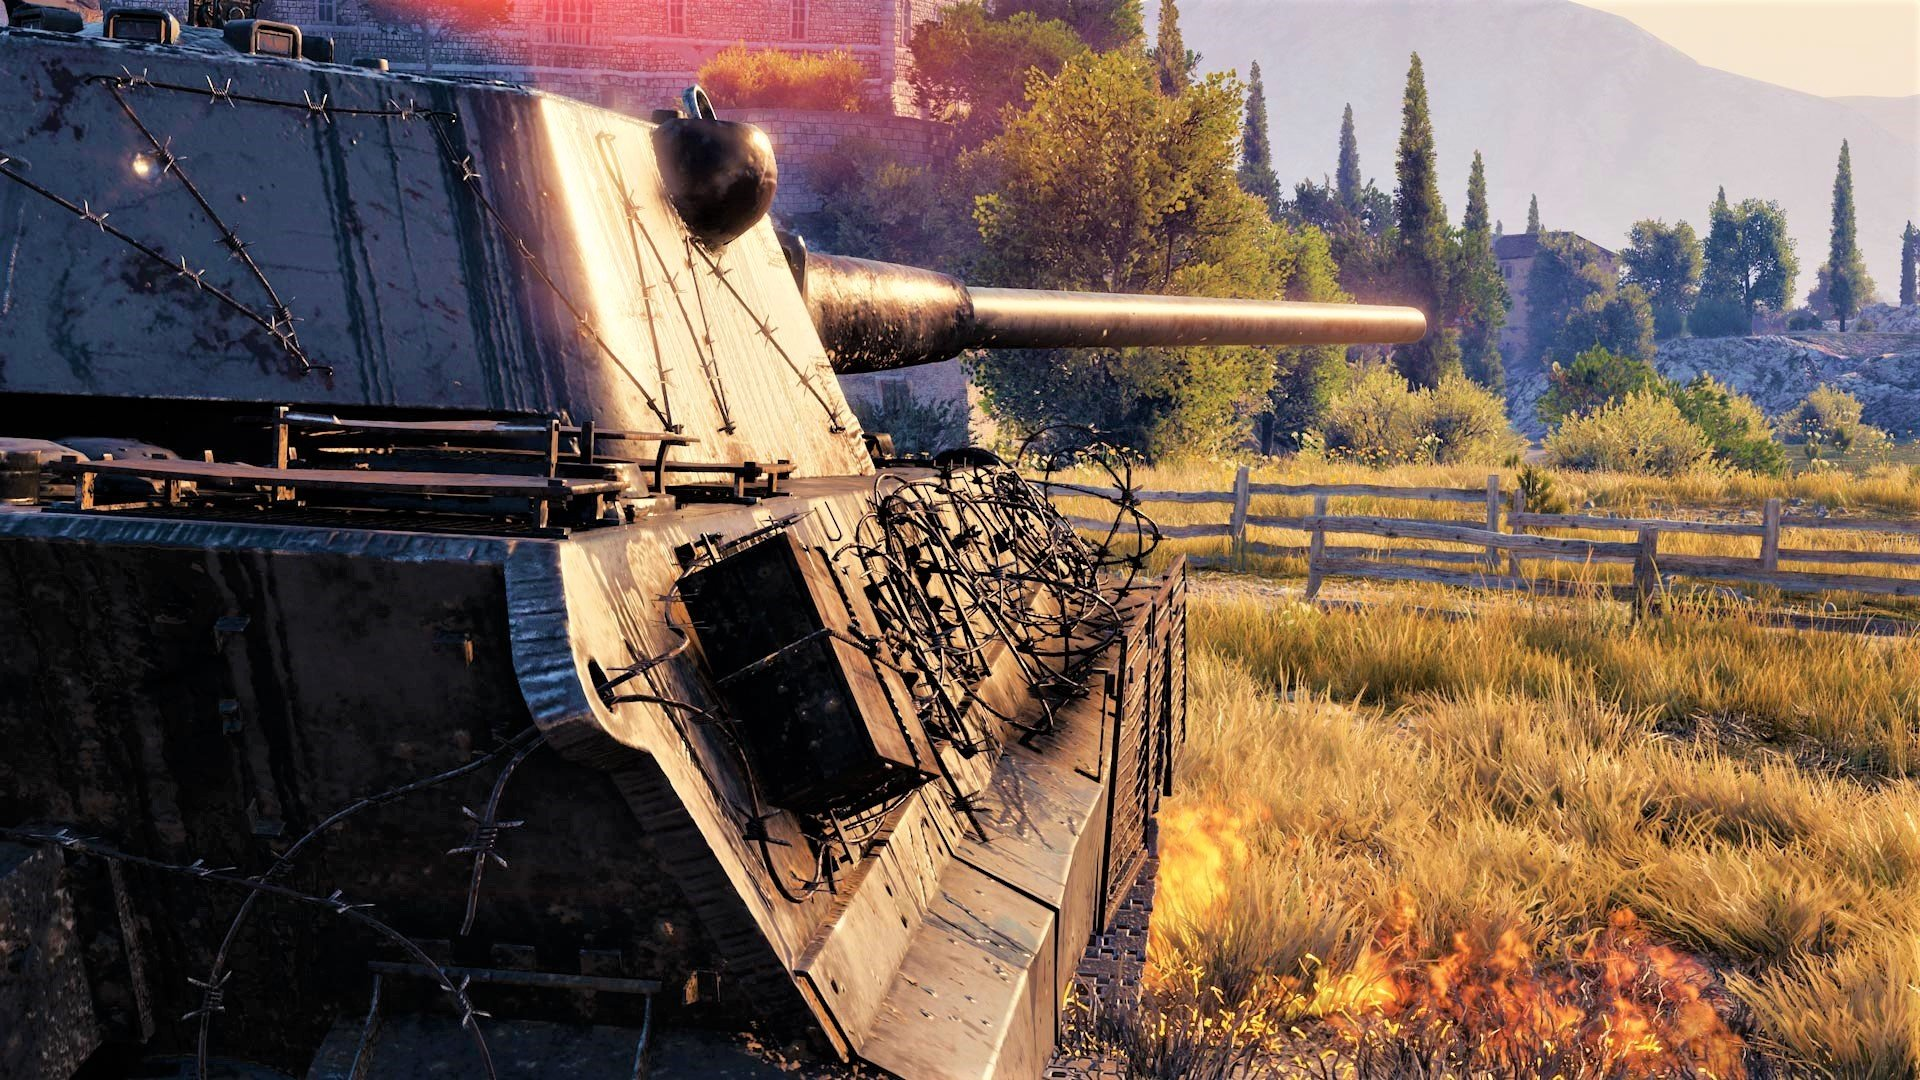 best ww2 games main image world of tanks - WW2 games: the best World War II games